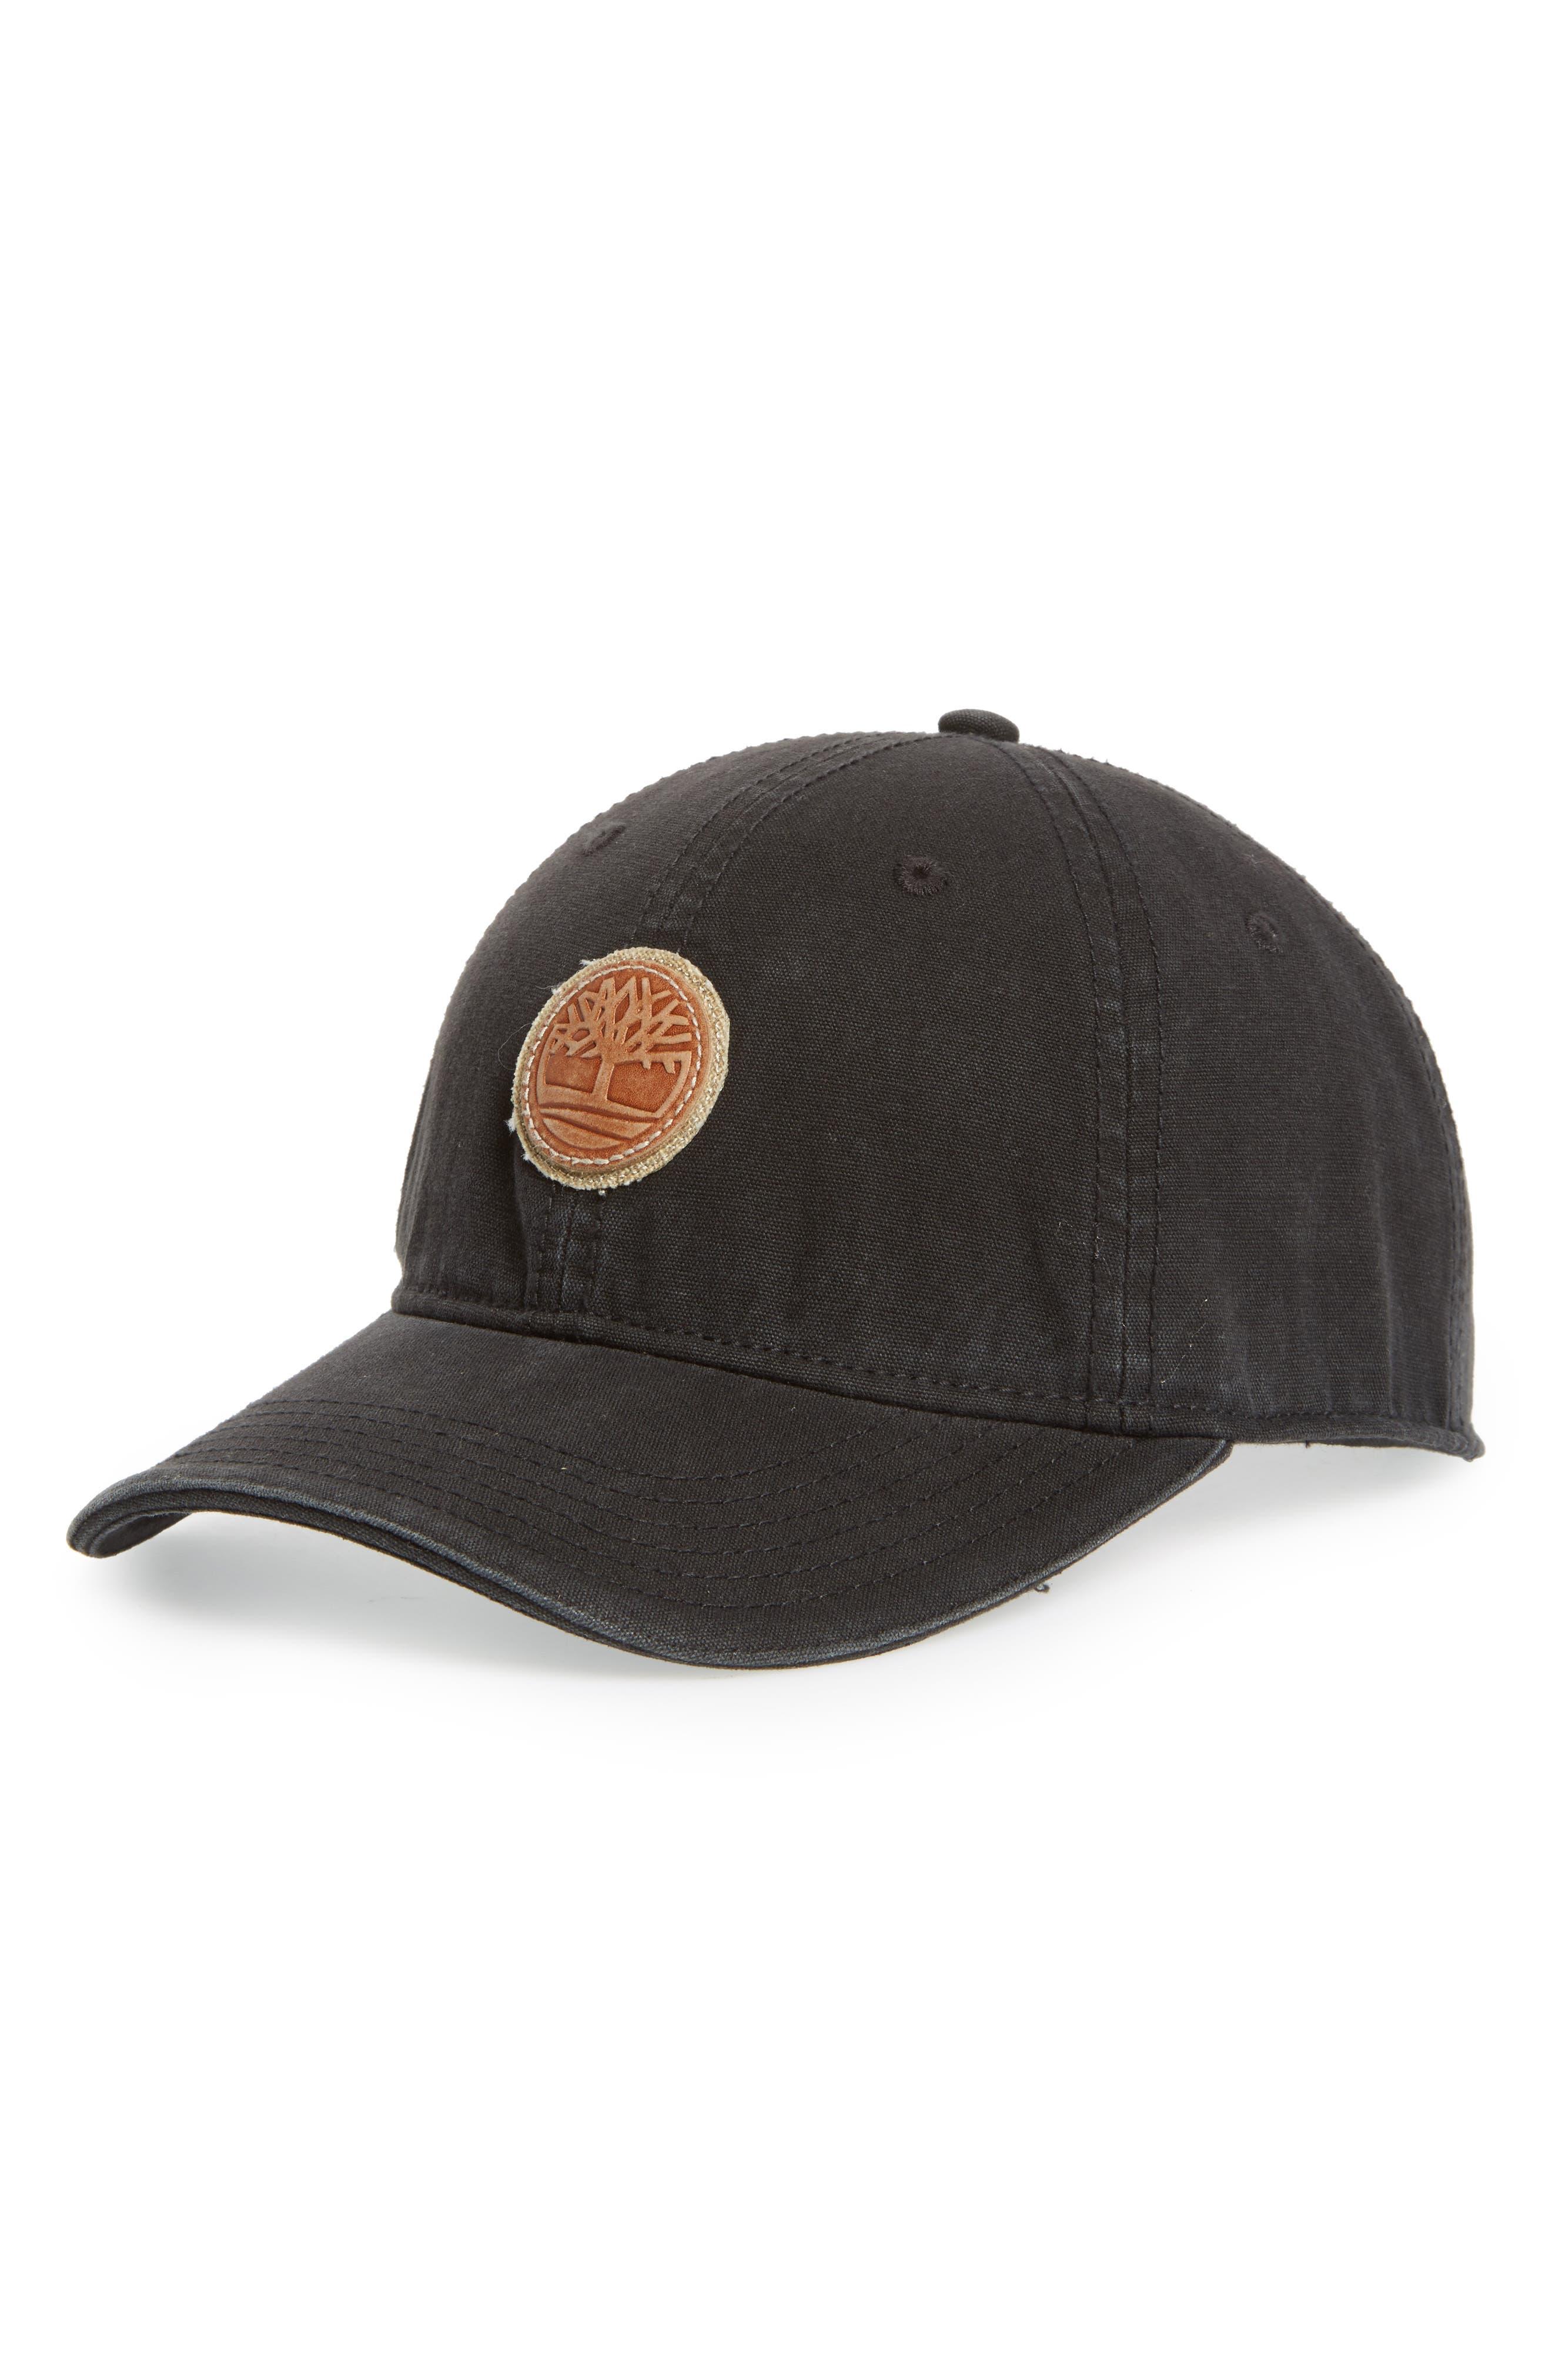 TIMBERLAND Rye Beach Logo Patch Ball Cap, Main, color, BLACK